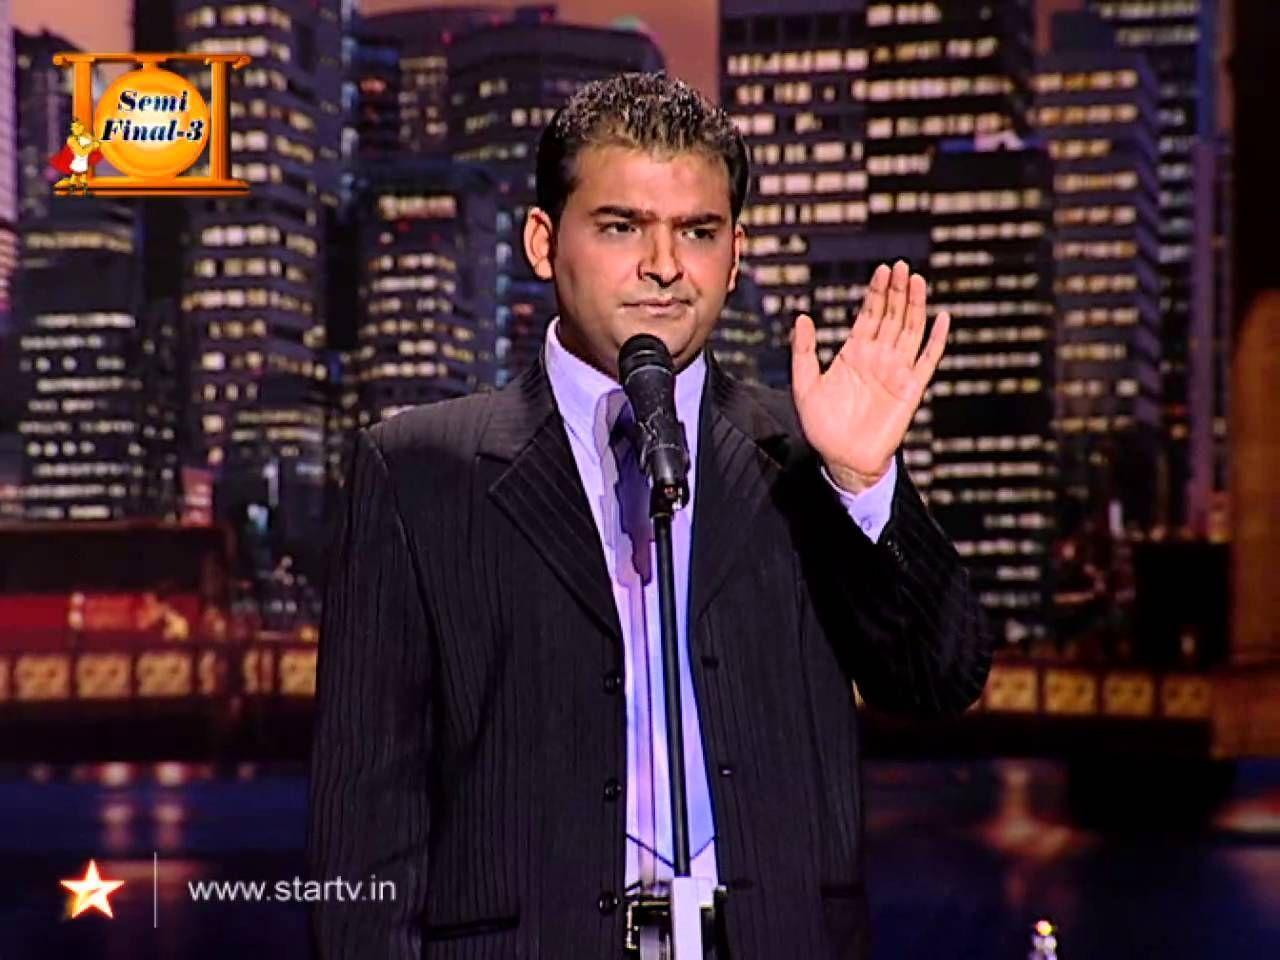 5 Biggest Milestones In Kapil Sharma's Career - DesiMartini